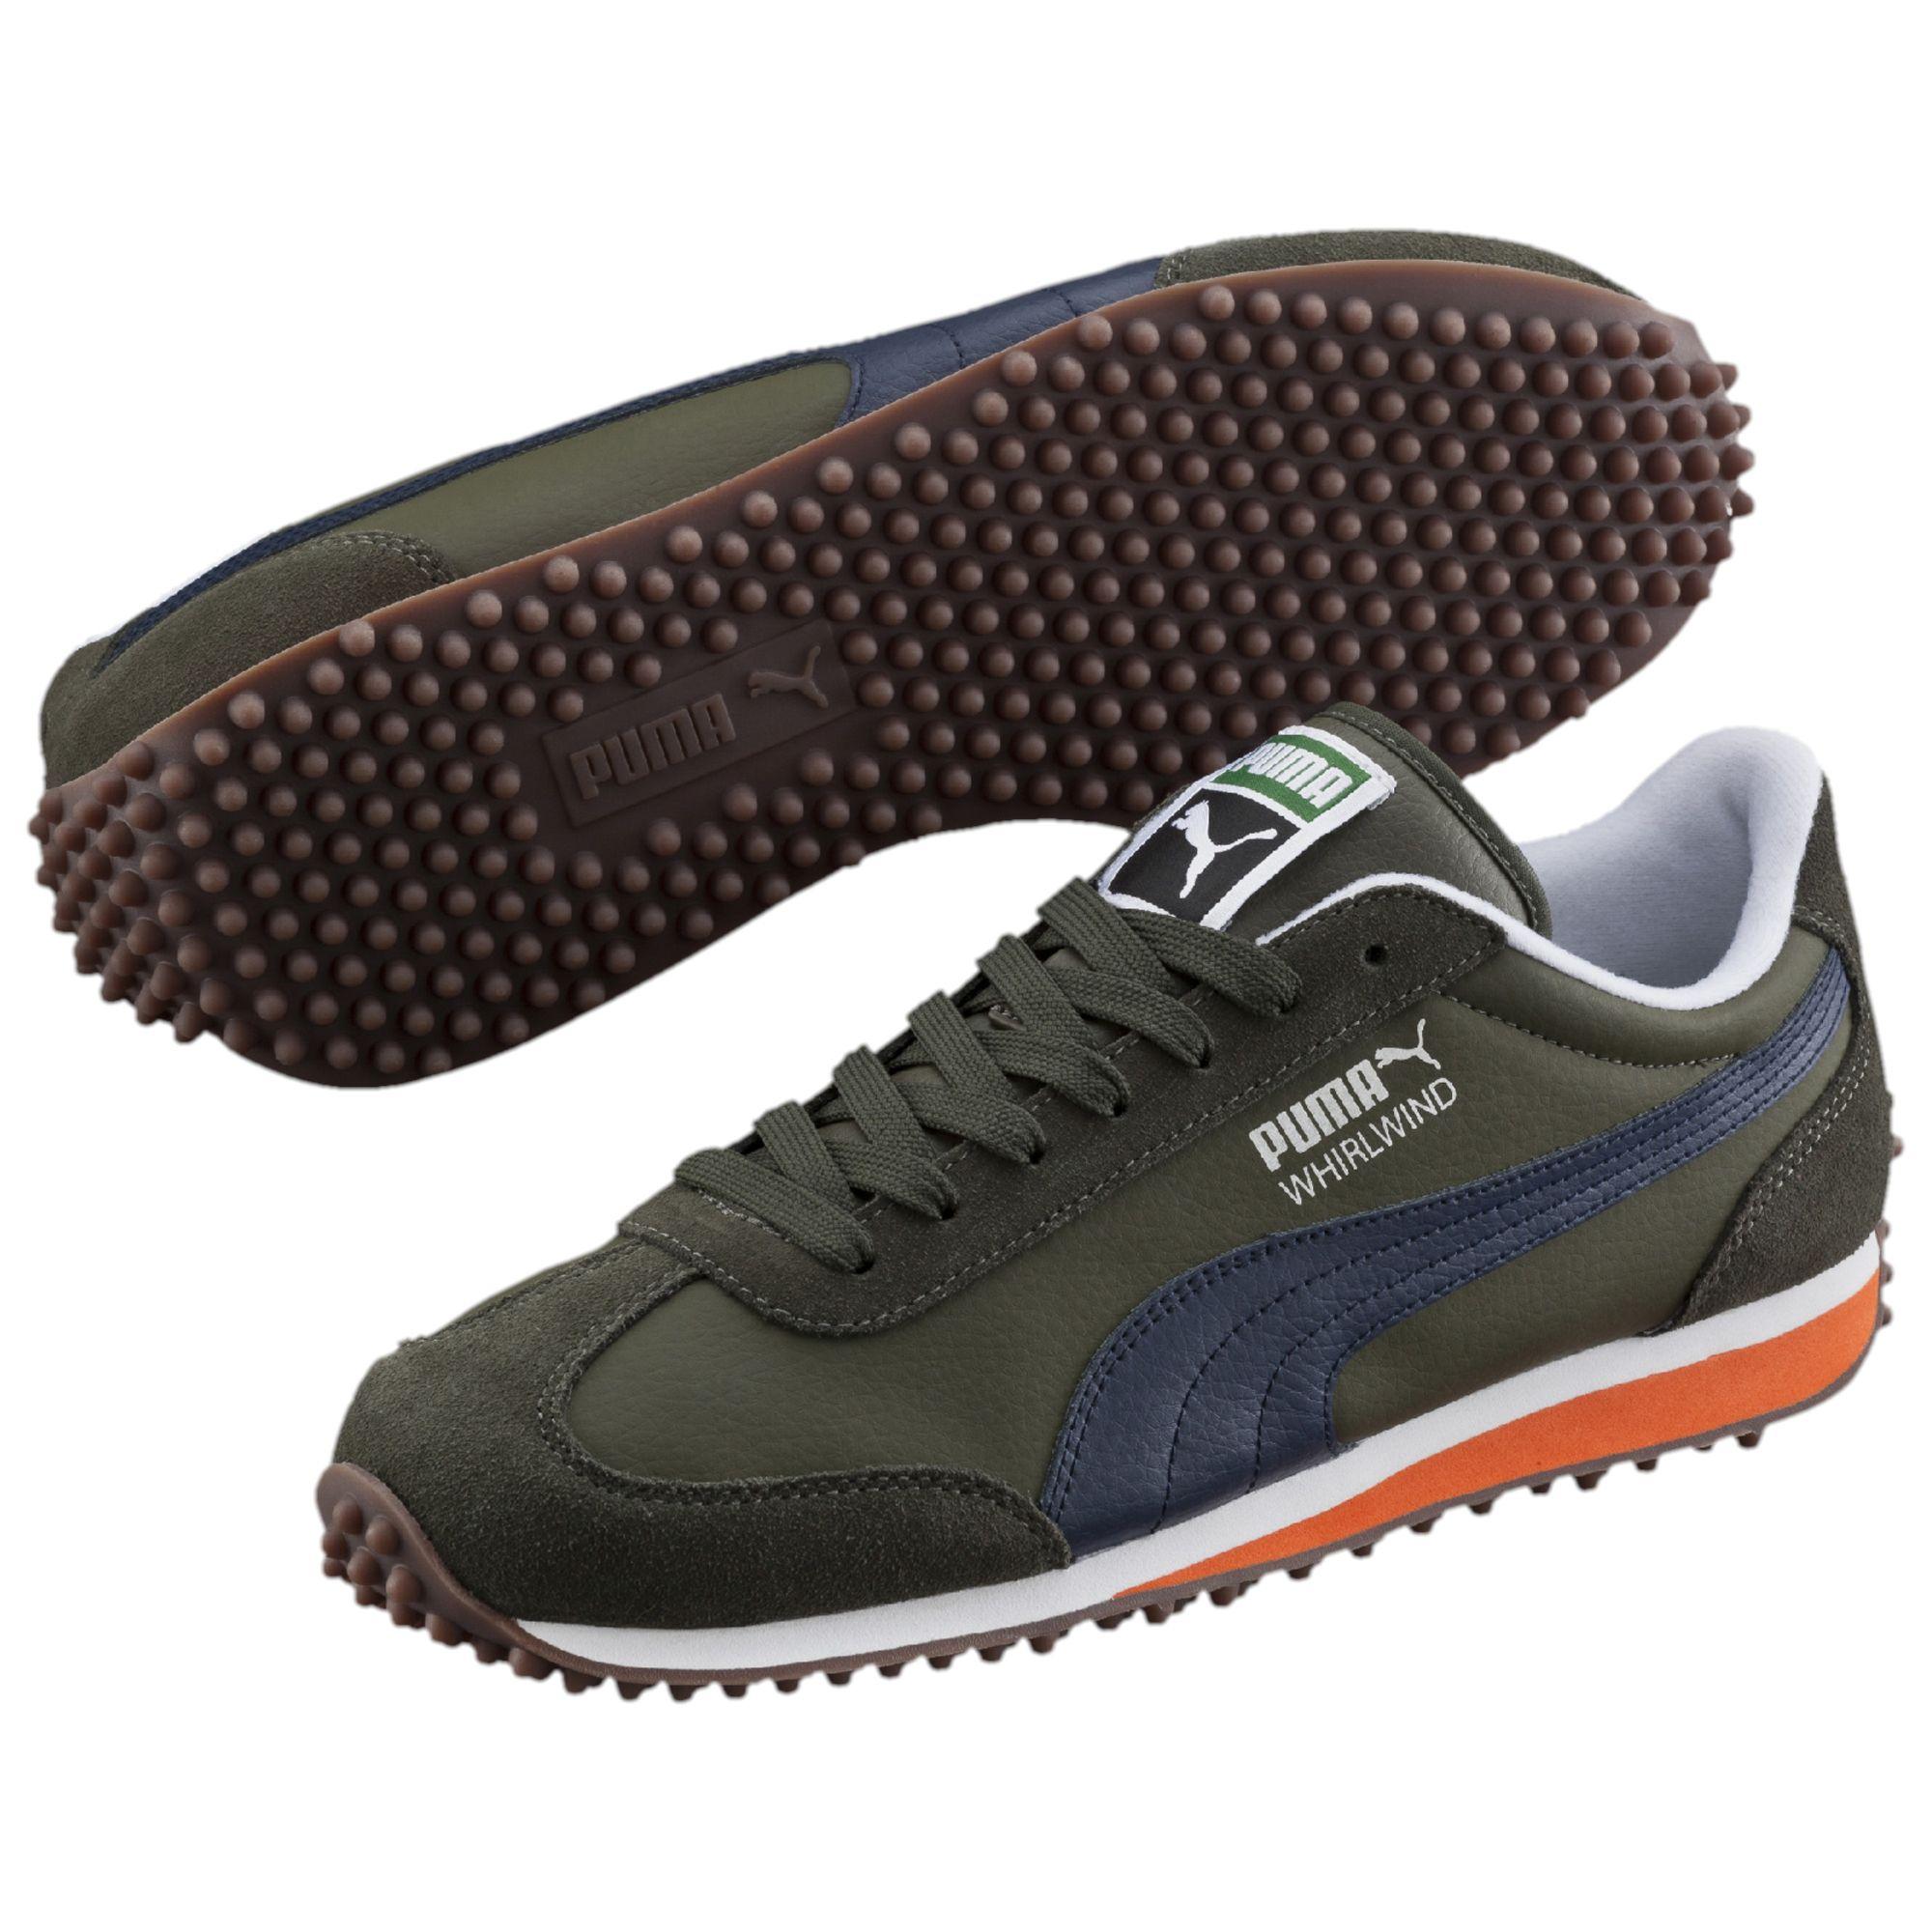 puma whirlwind leder sneaker schuhe sneakers sportschuhe. Black Bedroom Furniture Sets. Home Design Ideas